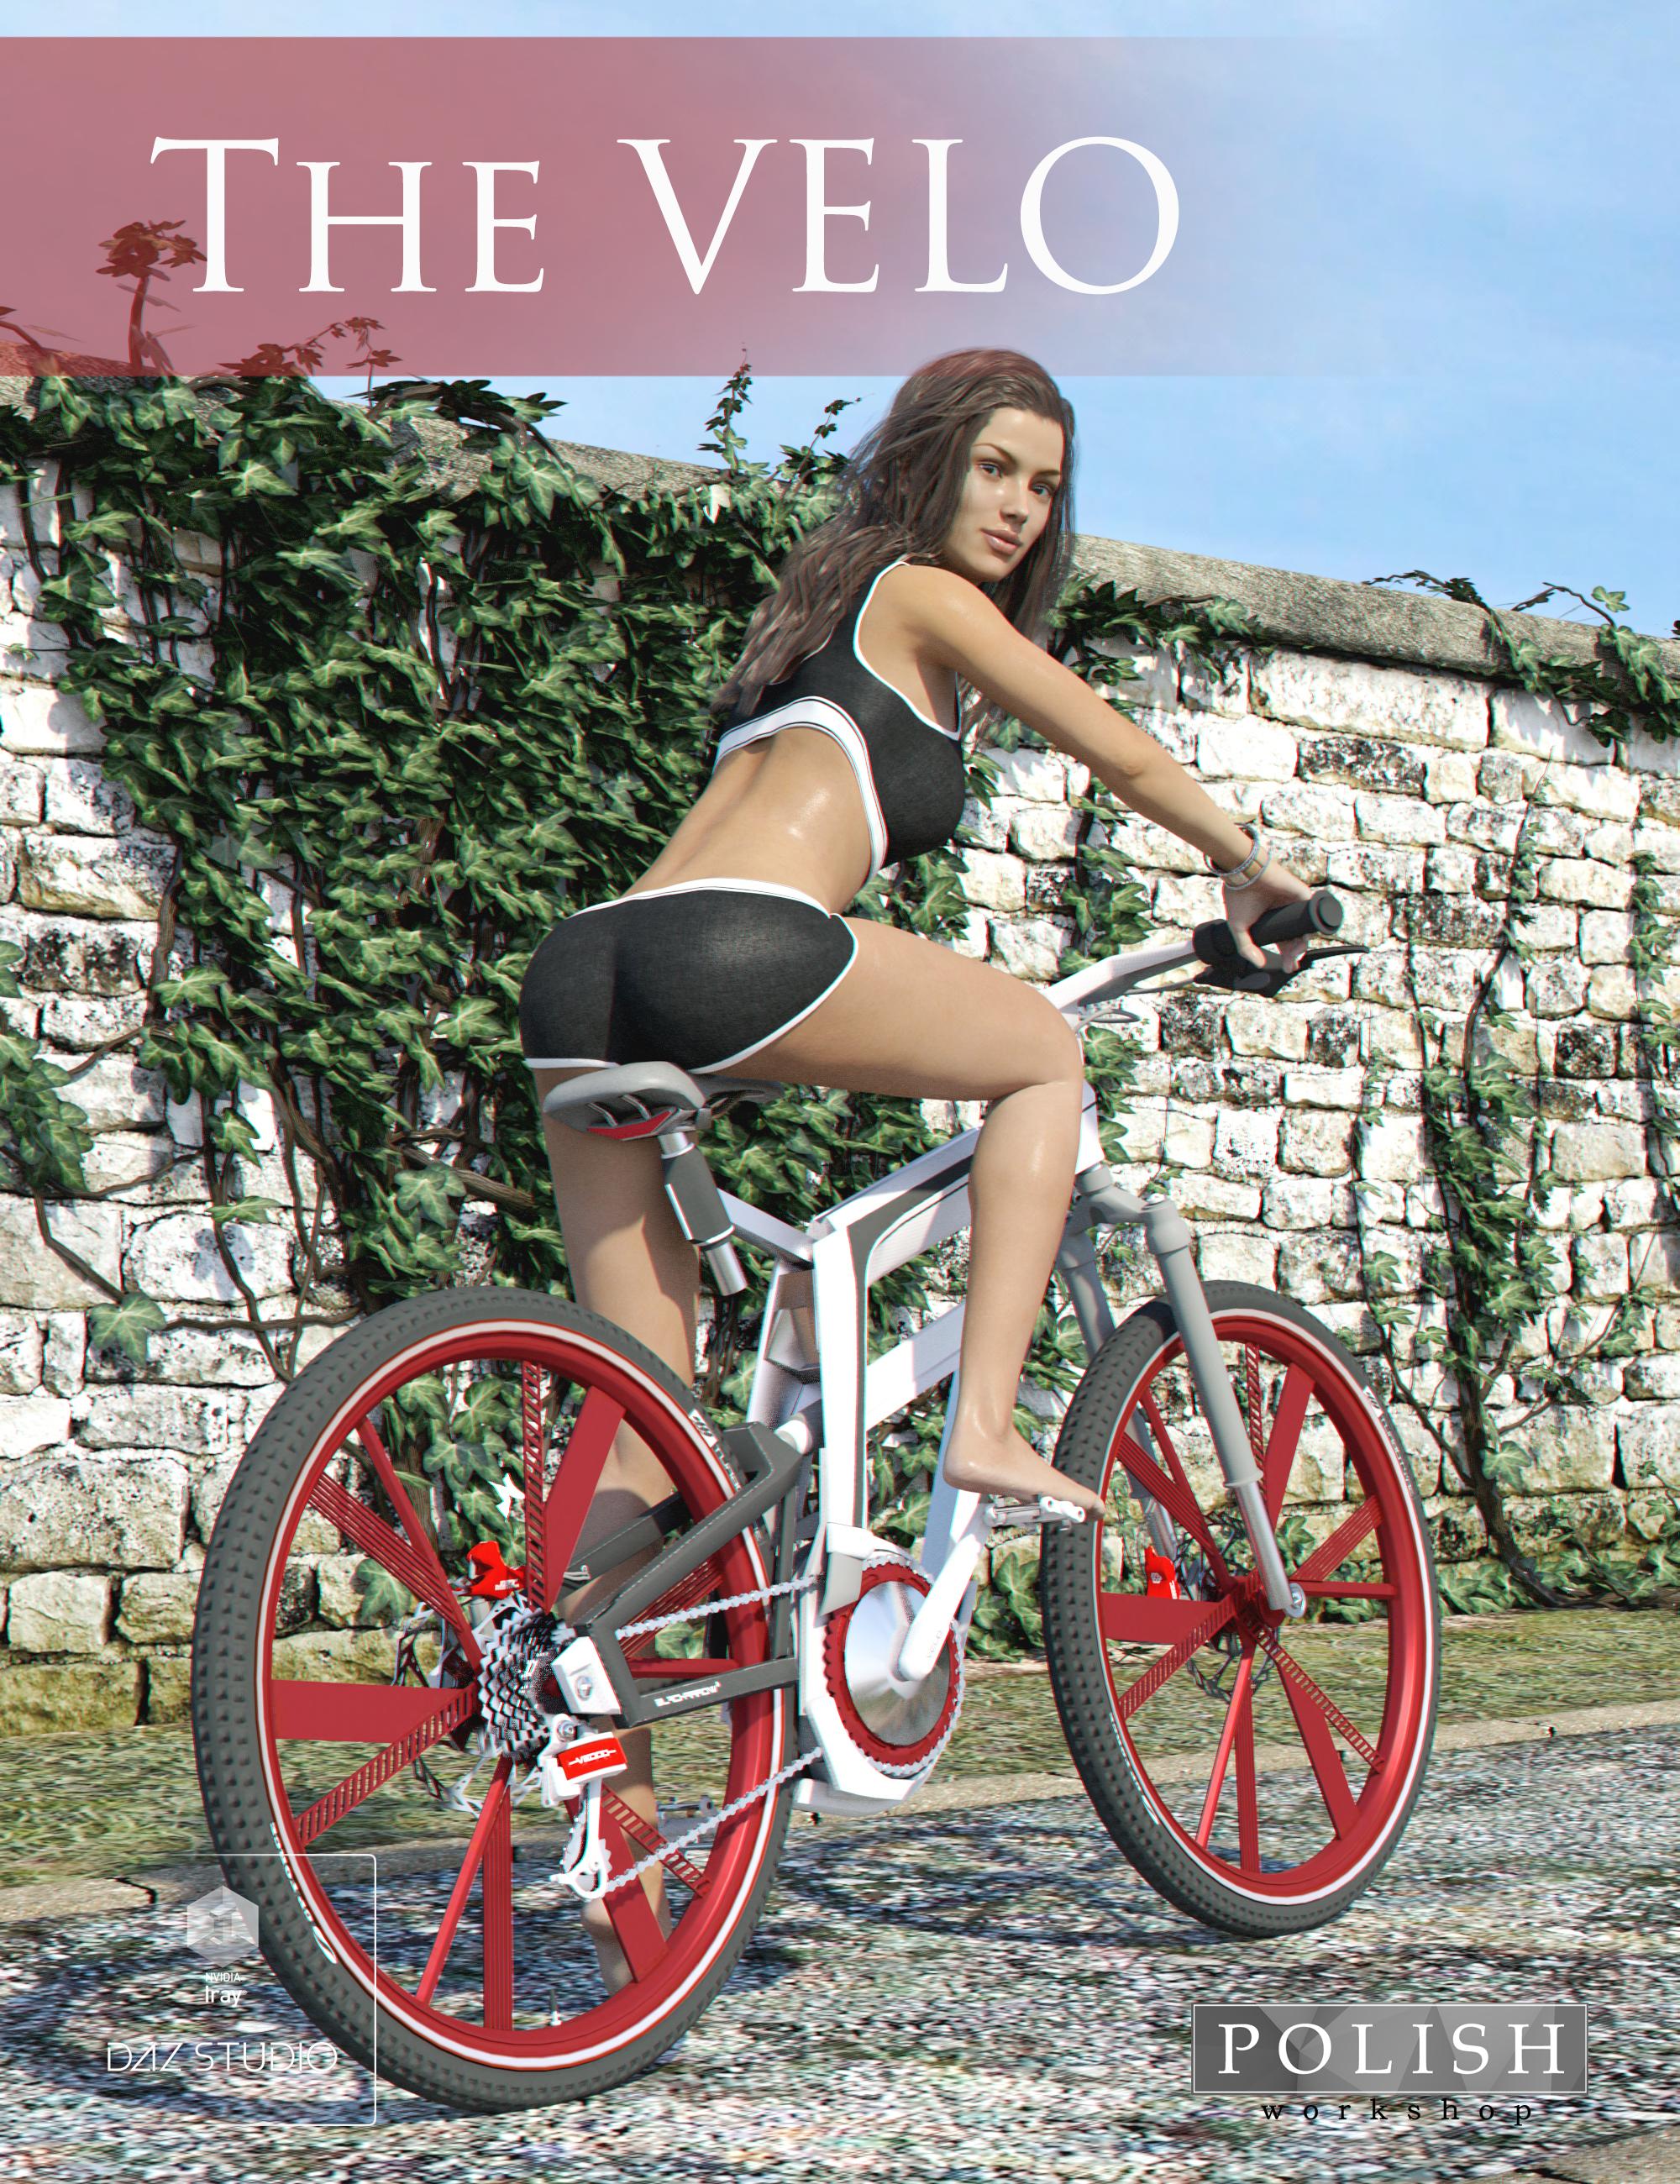 The Velo by: Polish, 3D Models by Daz 3D